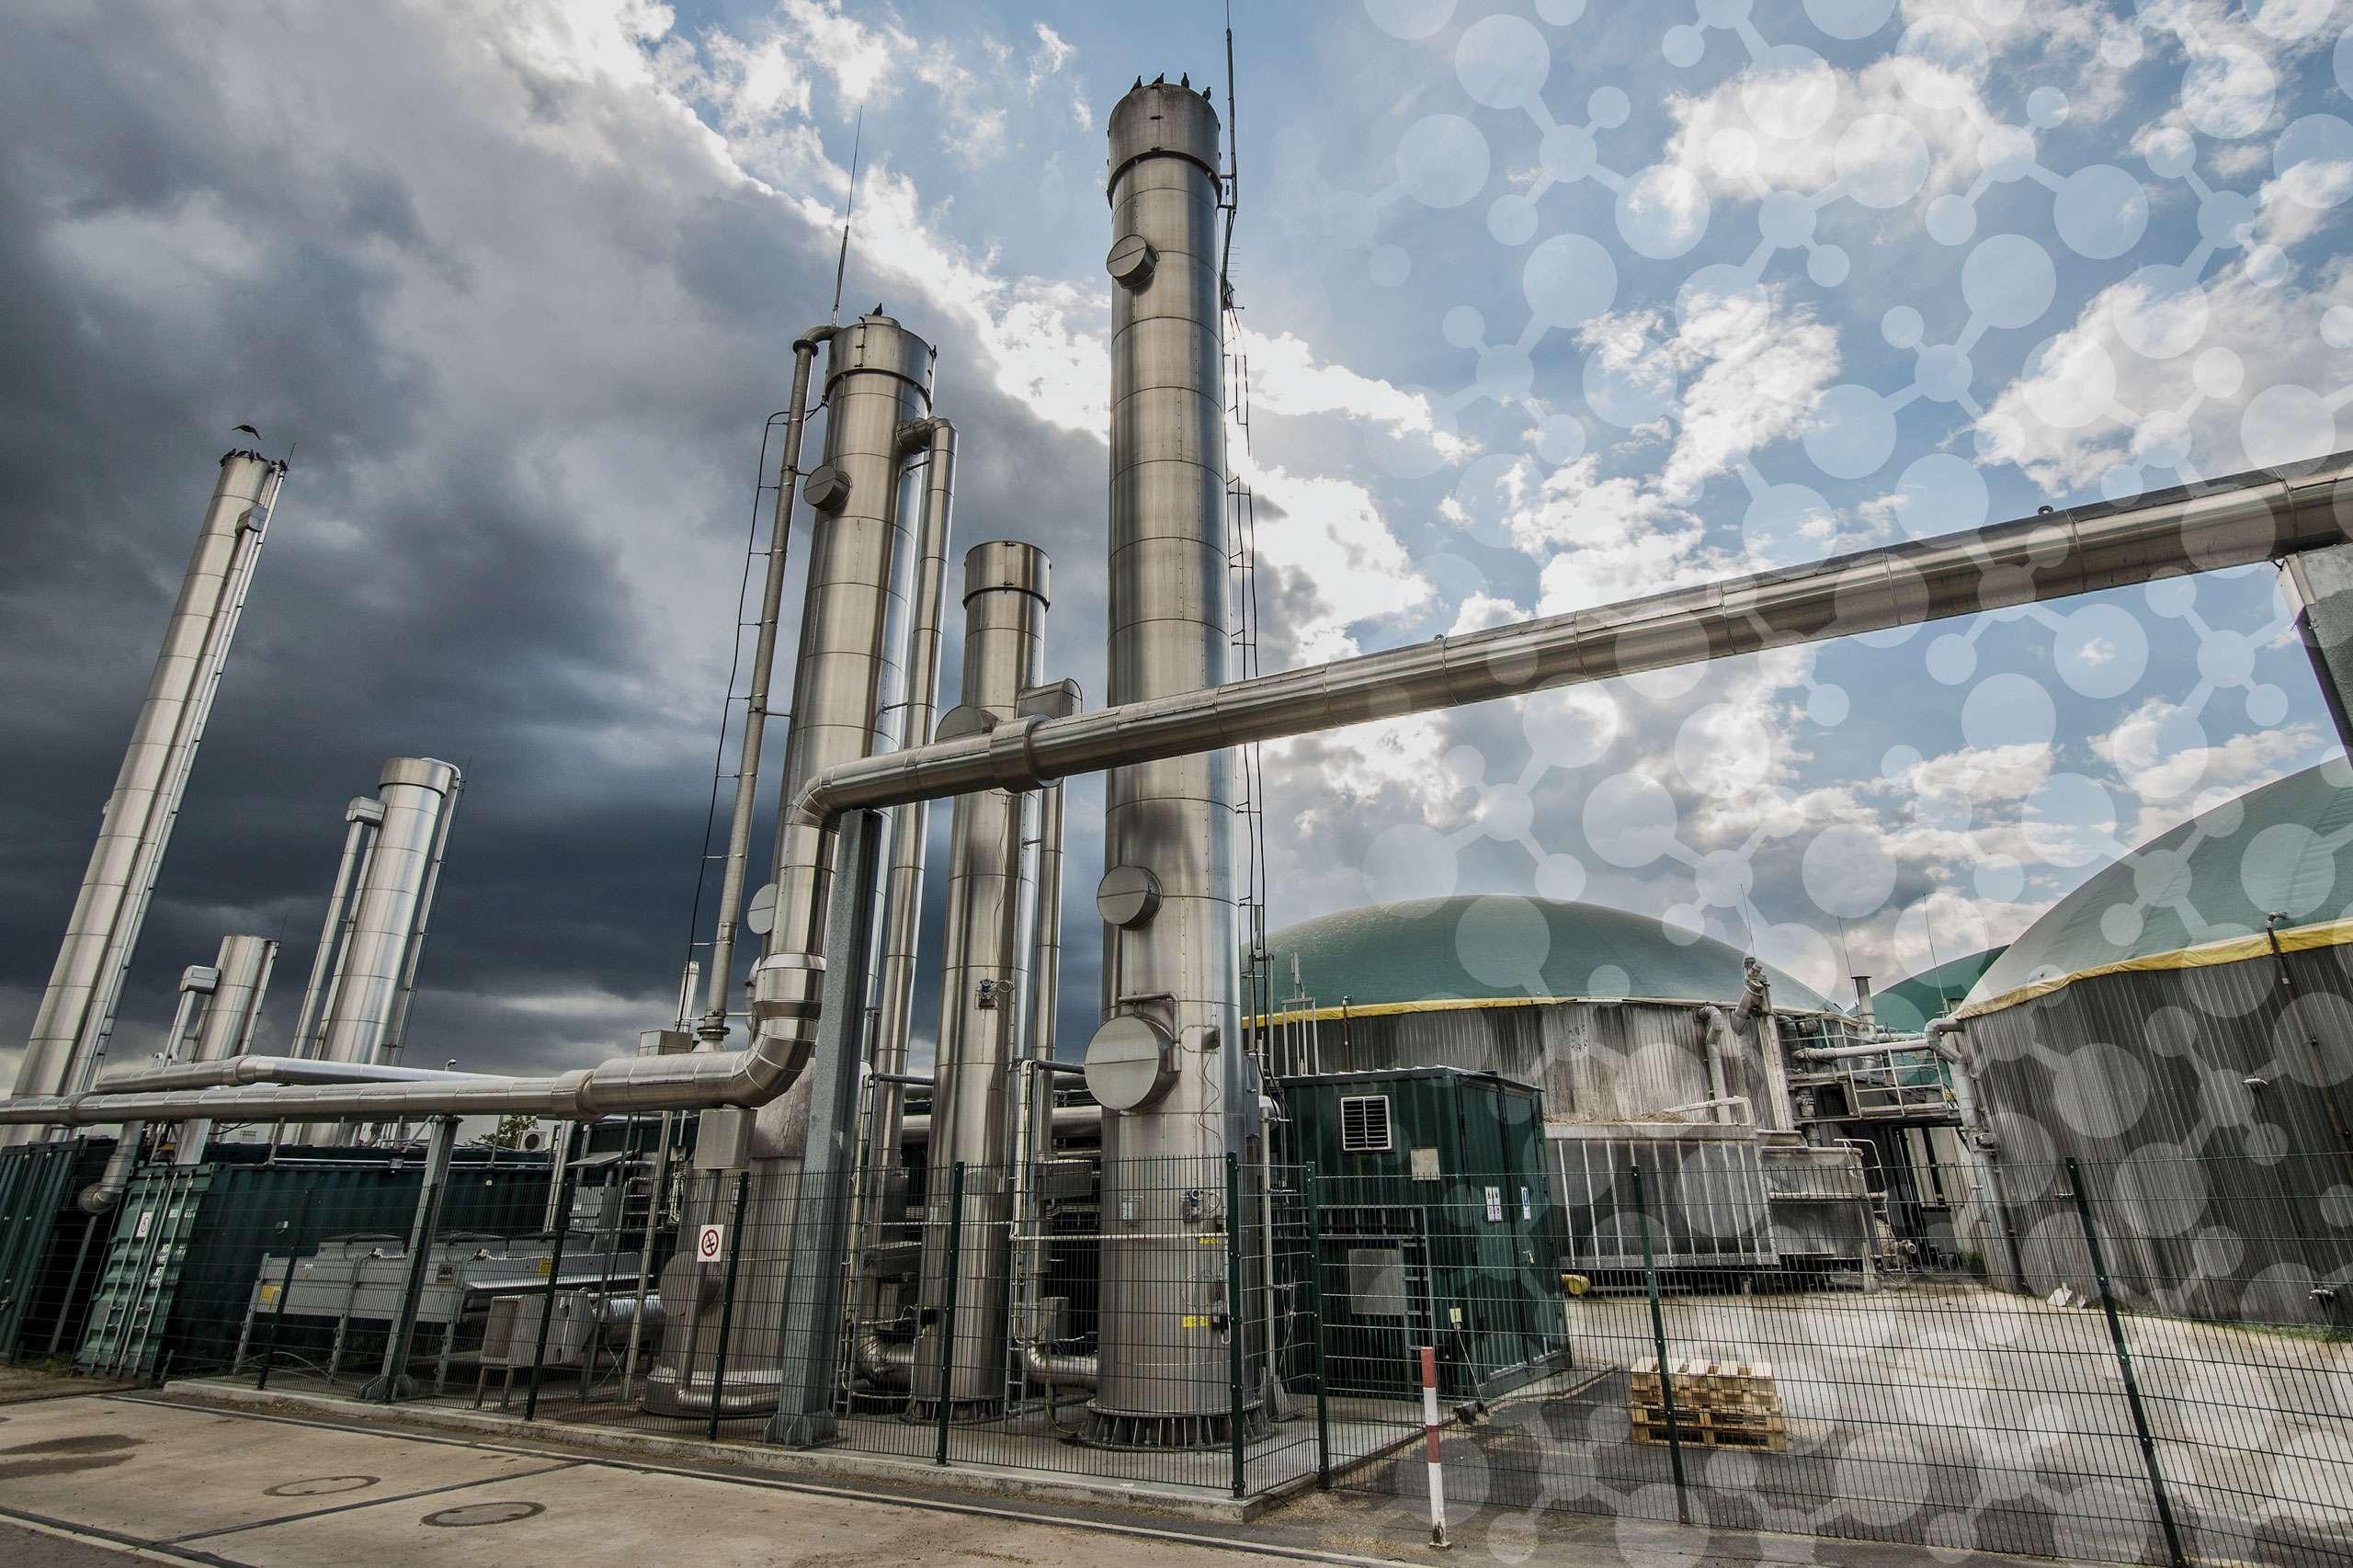 AD & biogas plant